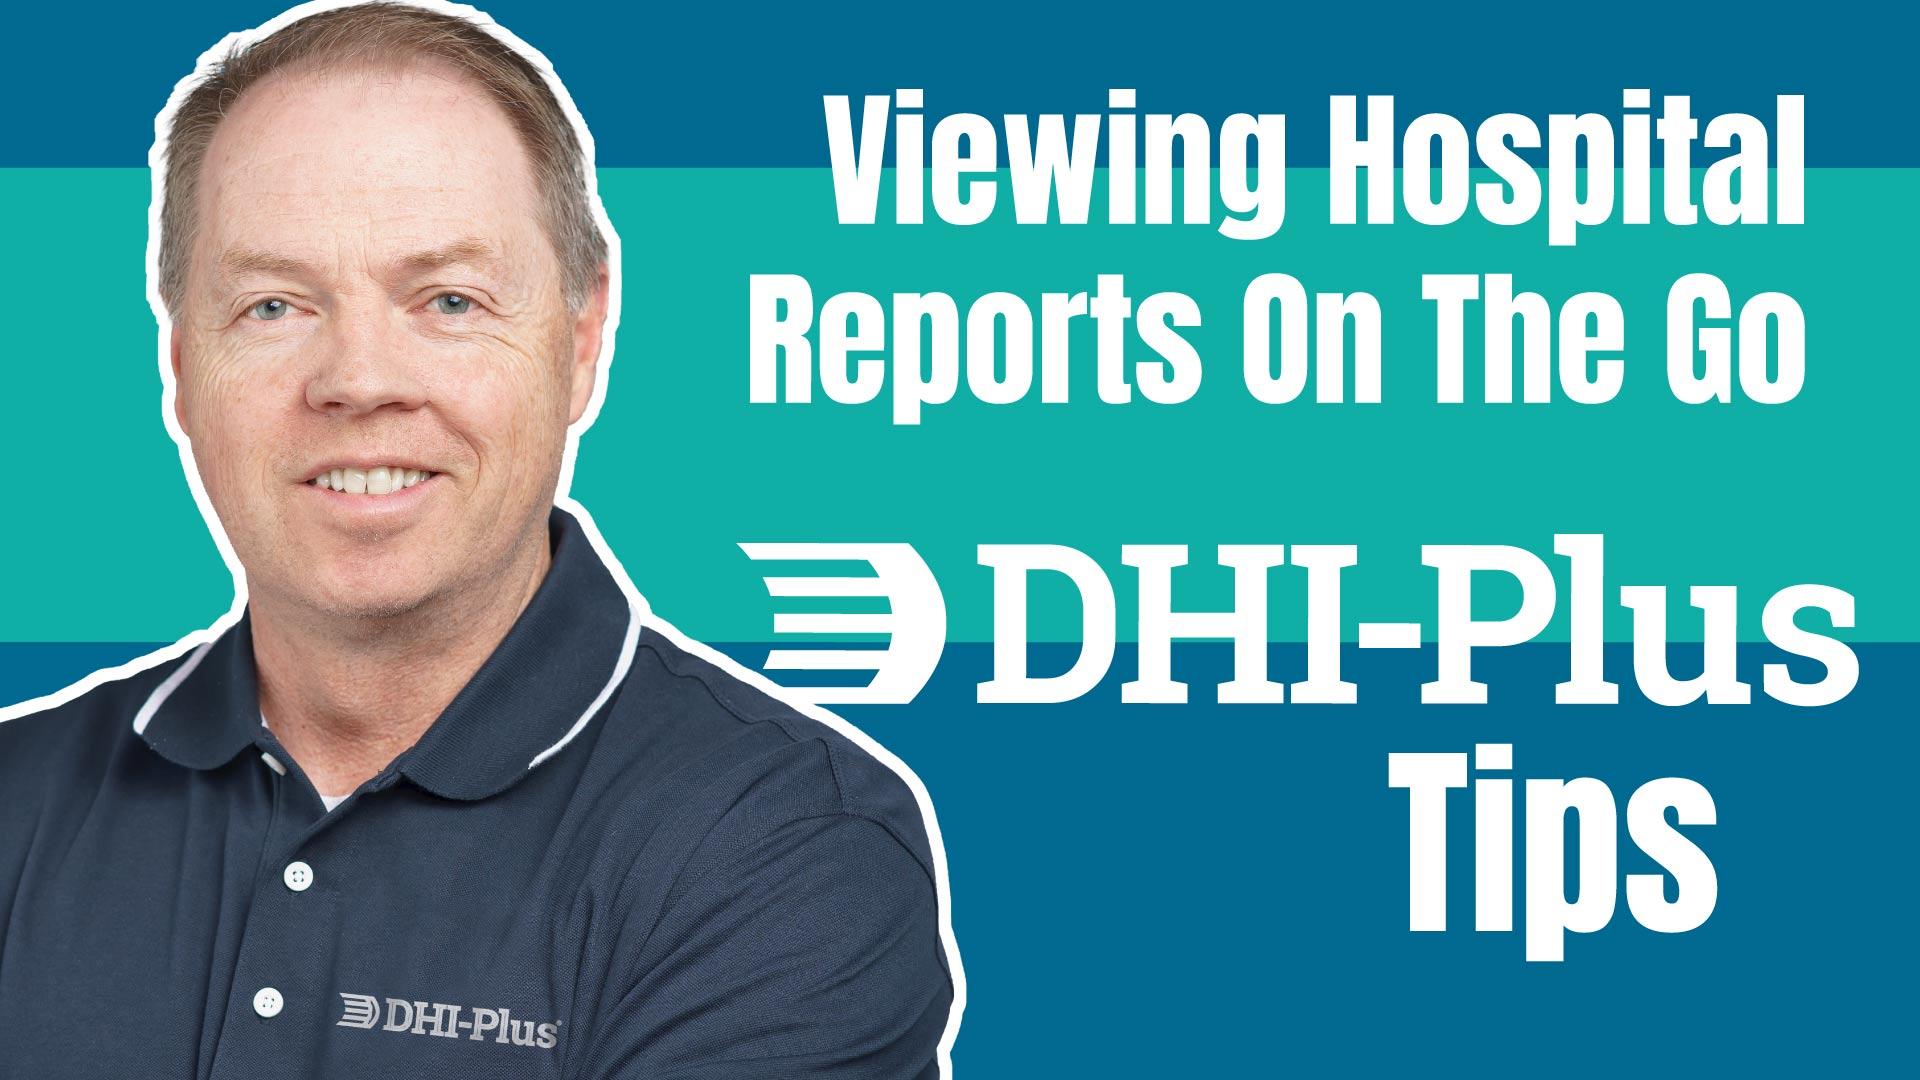 DPWM Hospital reports video 2020-05-18_11-20-46